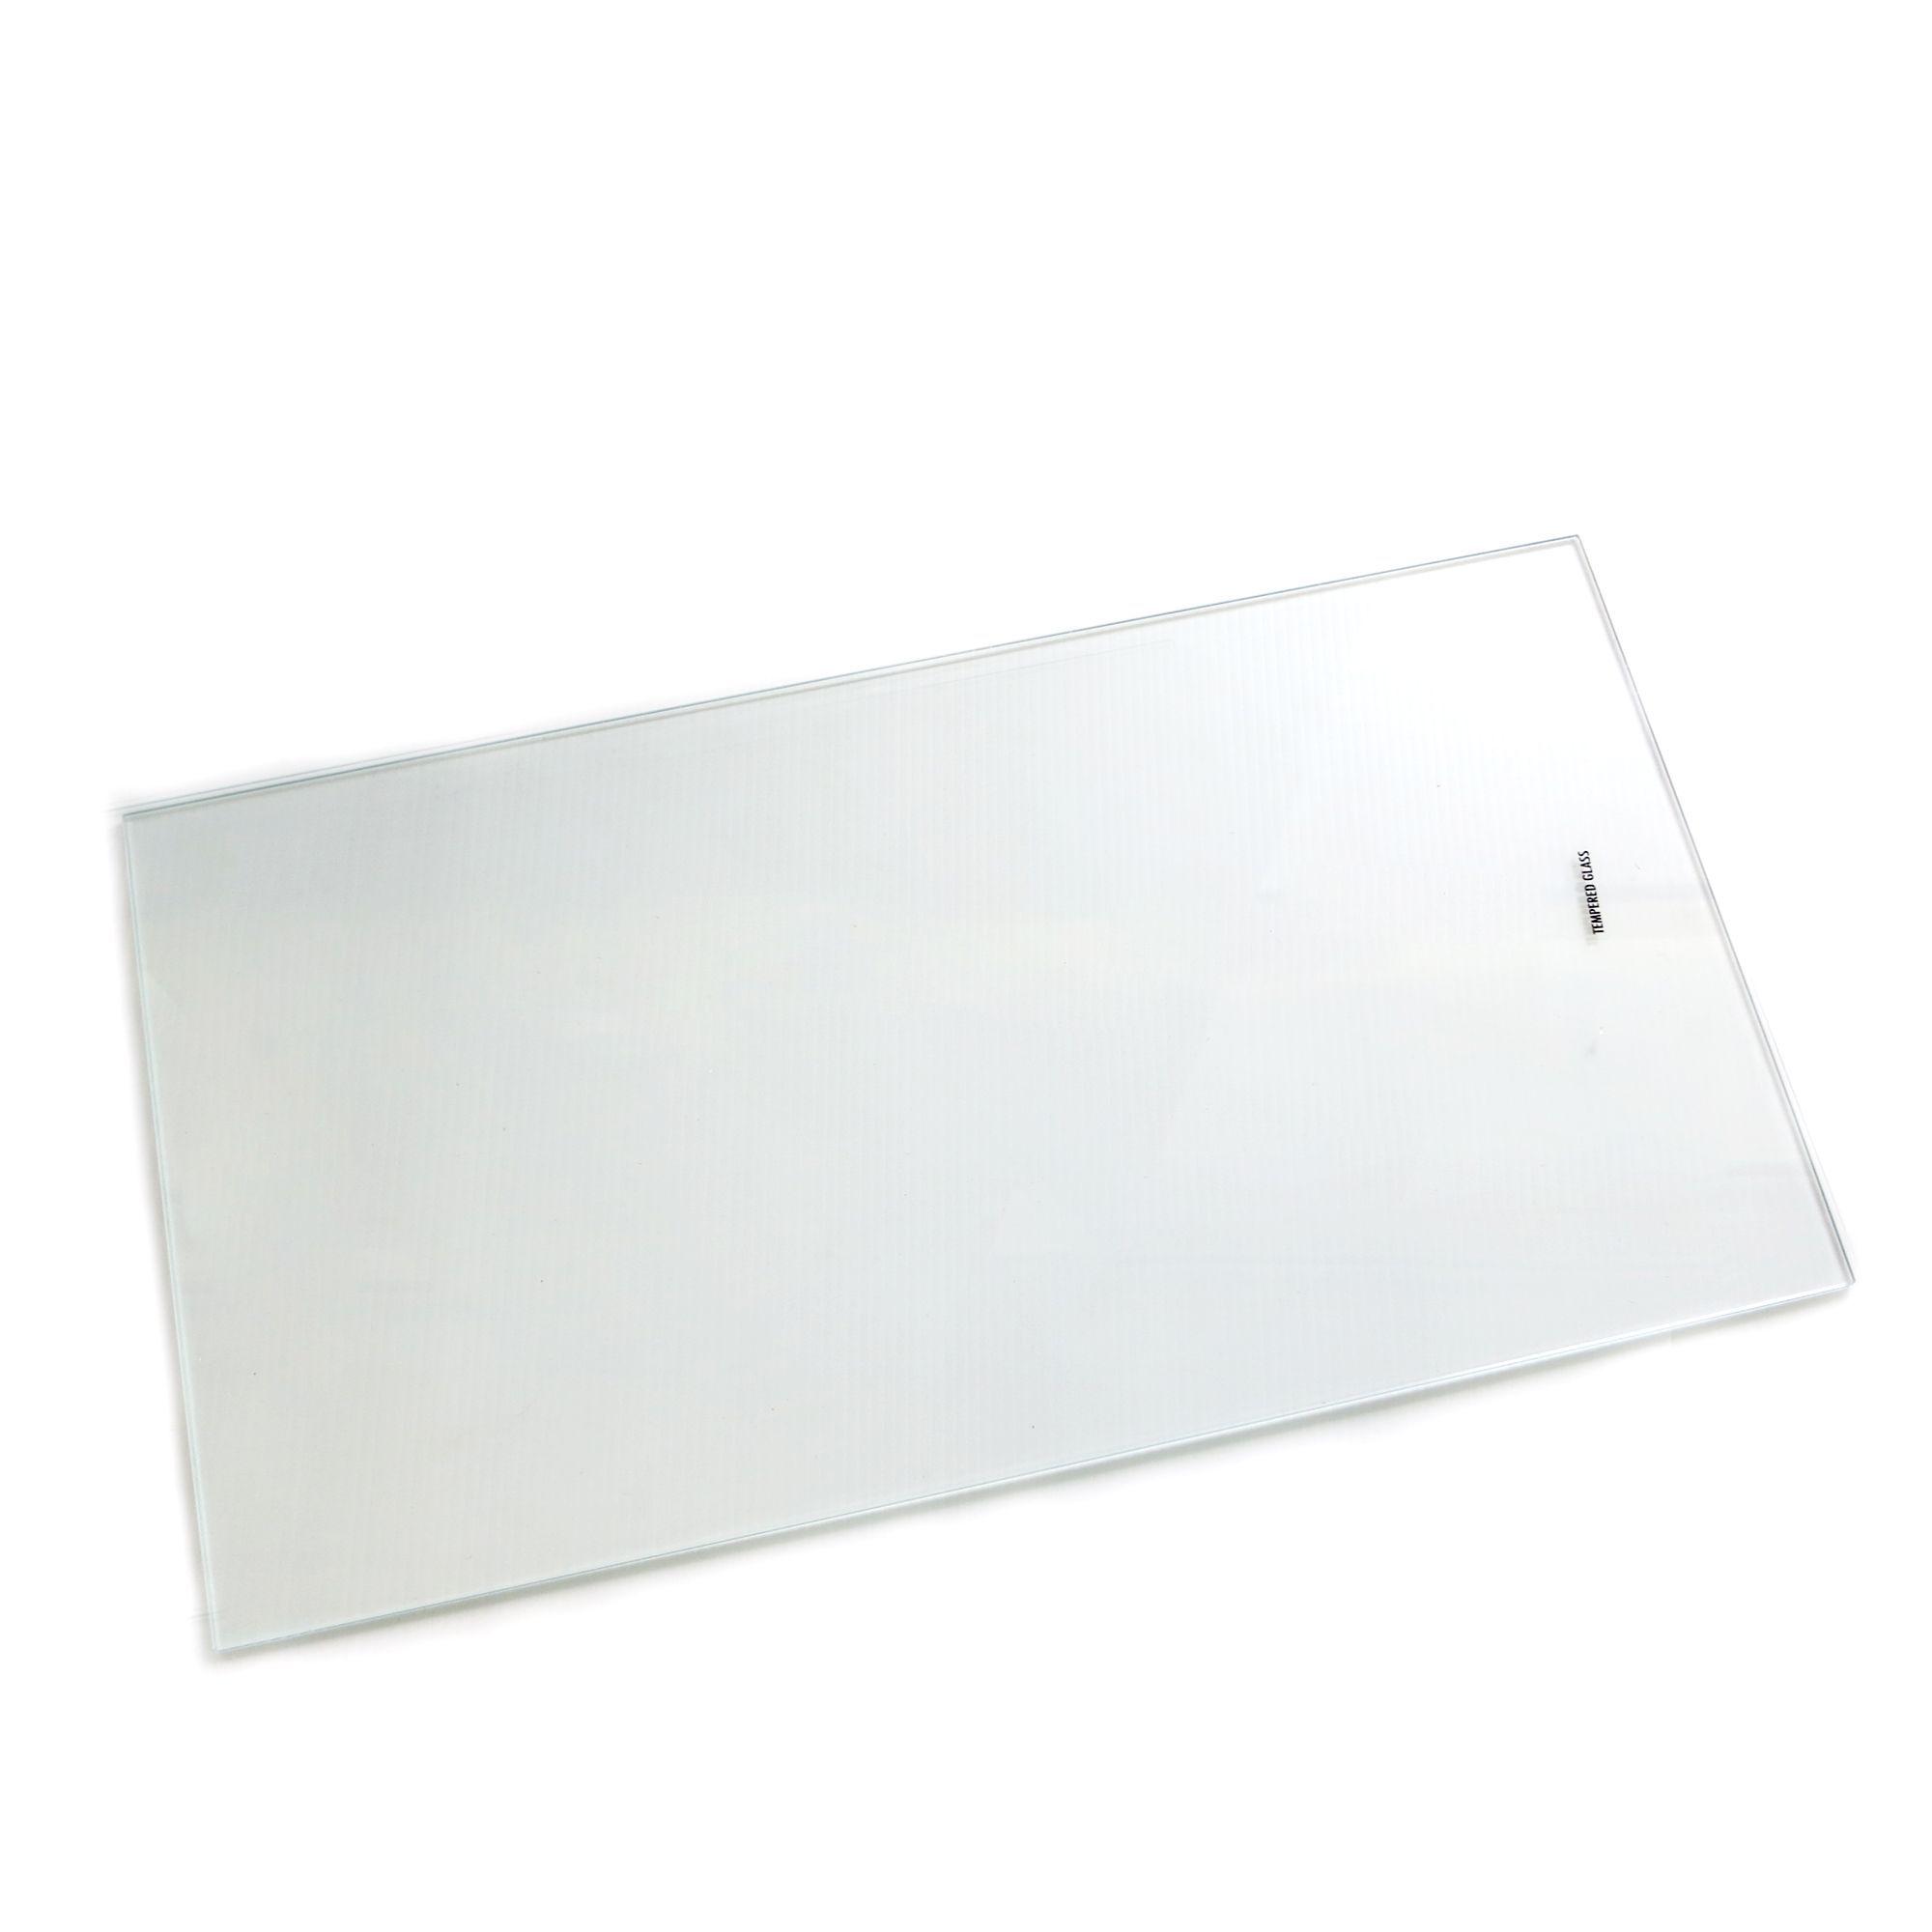 Clear Internal Glass Kitchen Cabinet Shelves (l)458mm (d)247mm, Pack Of 2